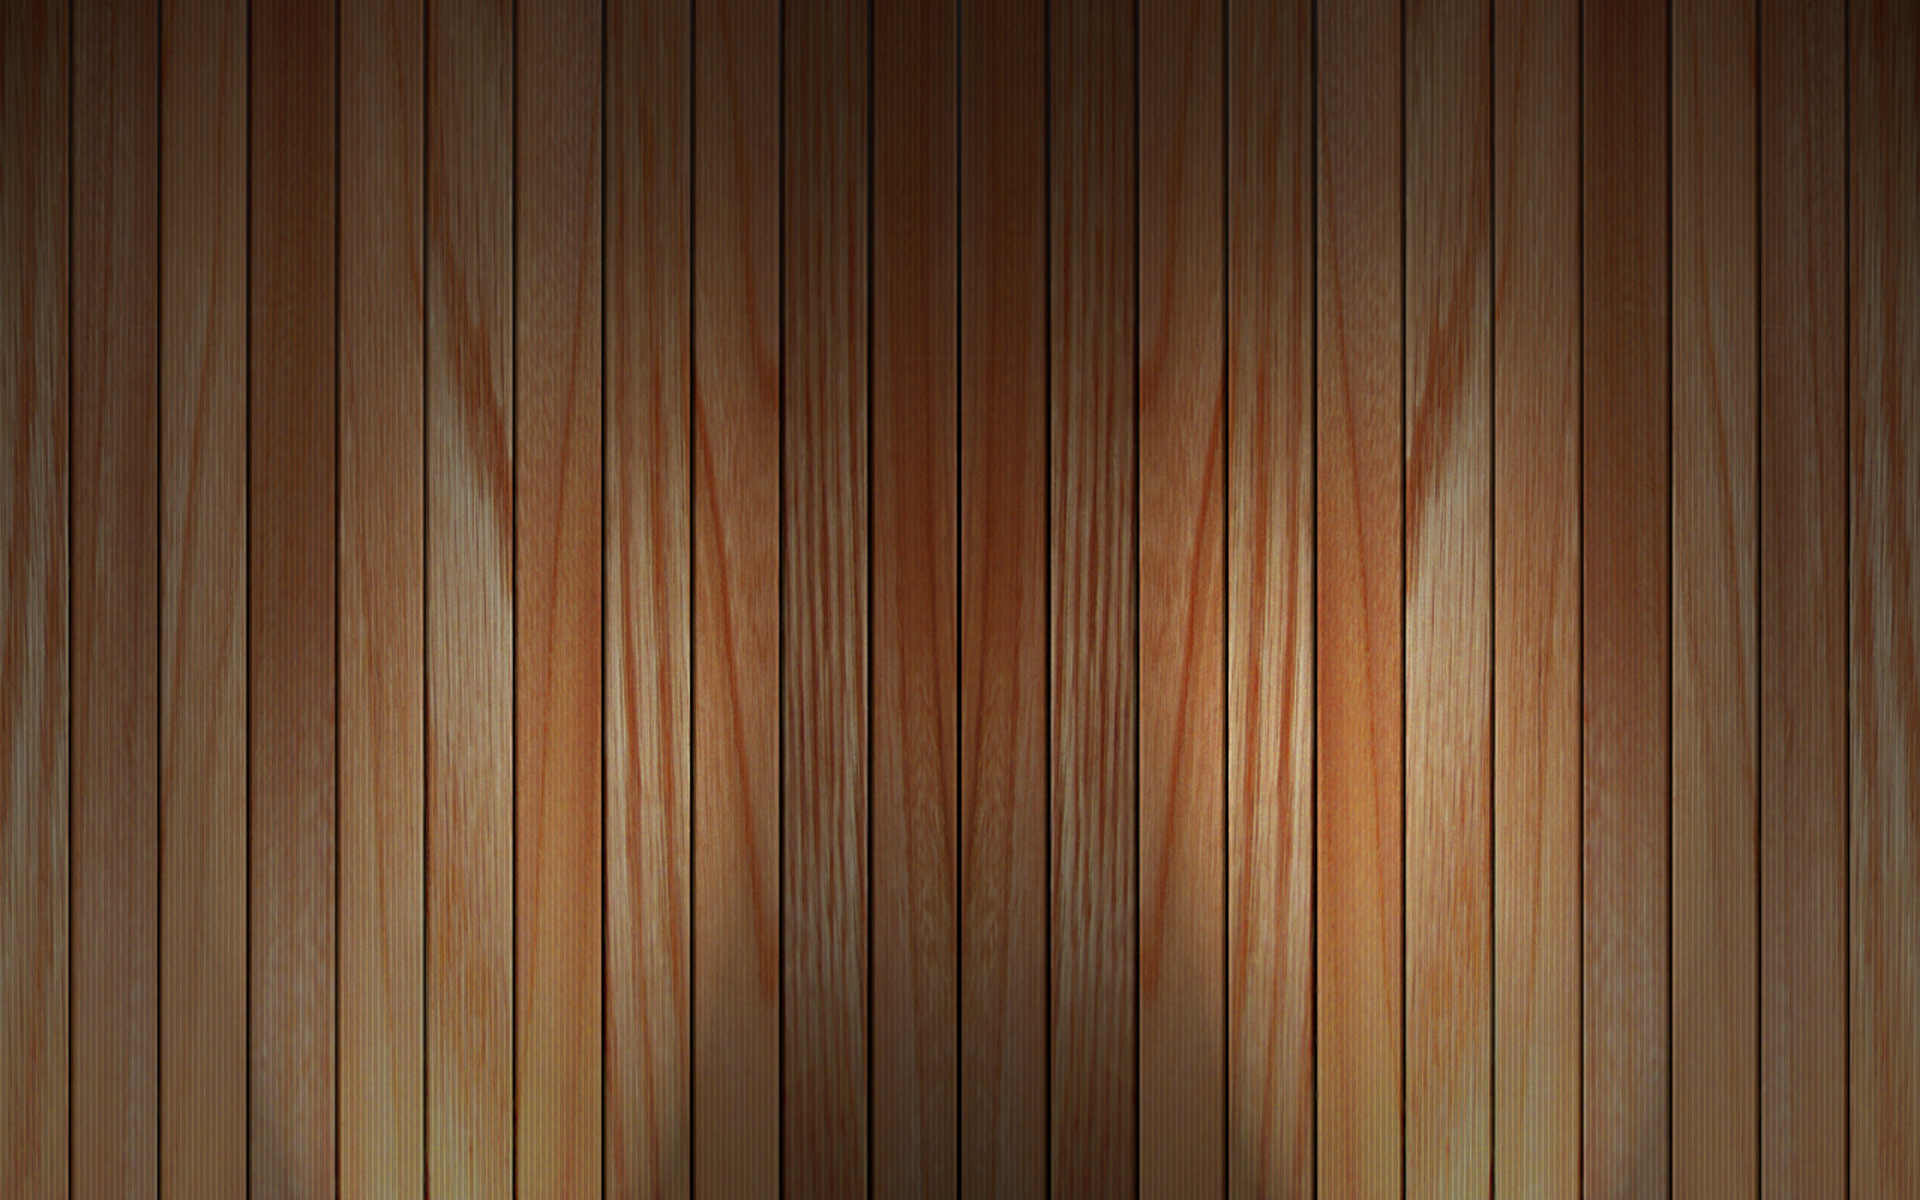 Wood HD wallpaper